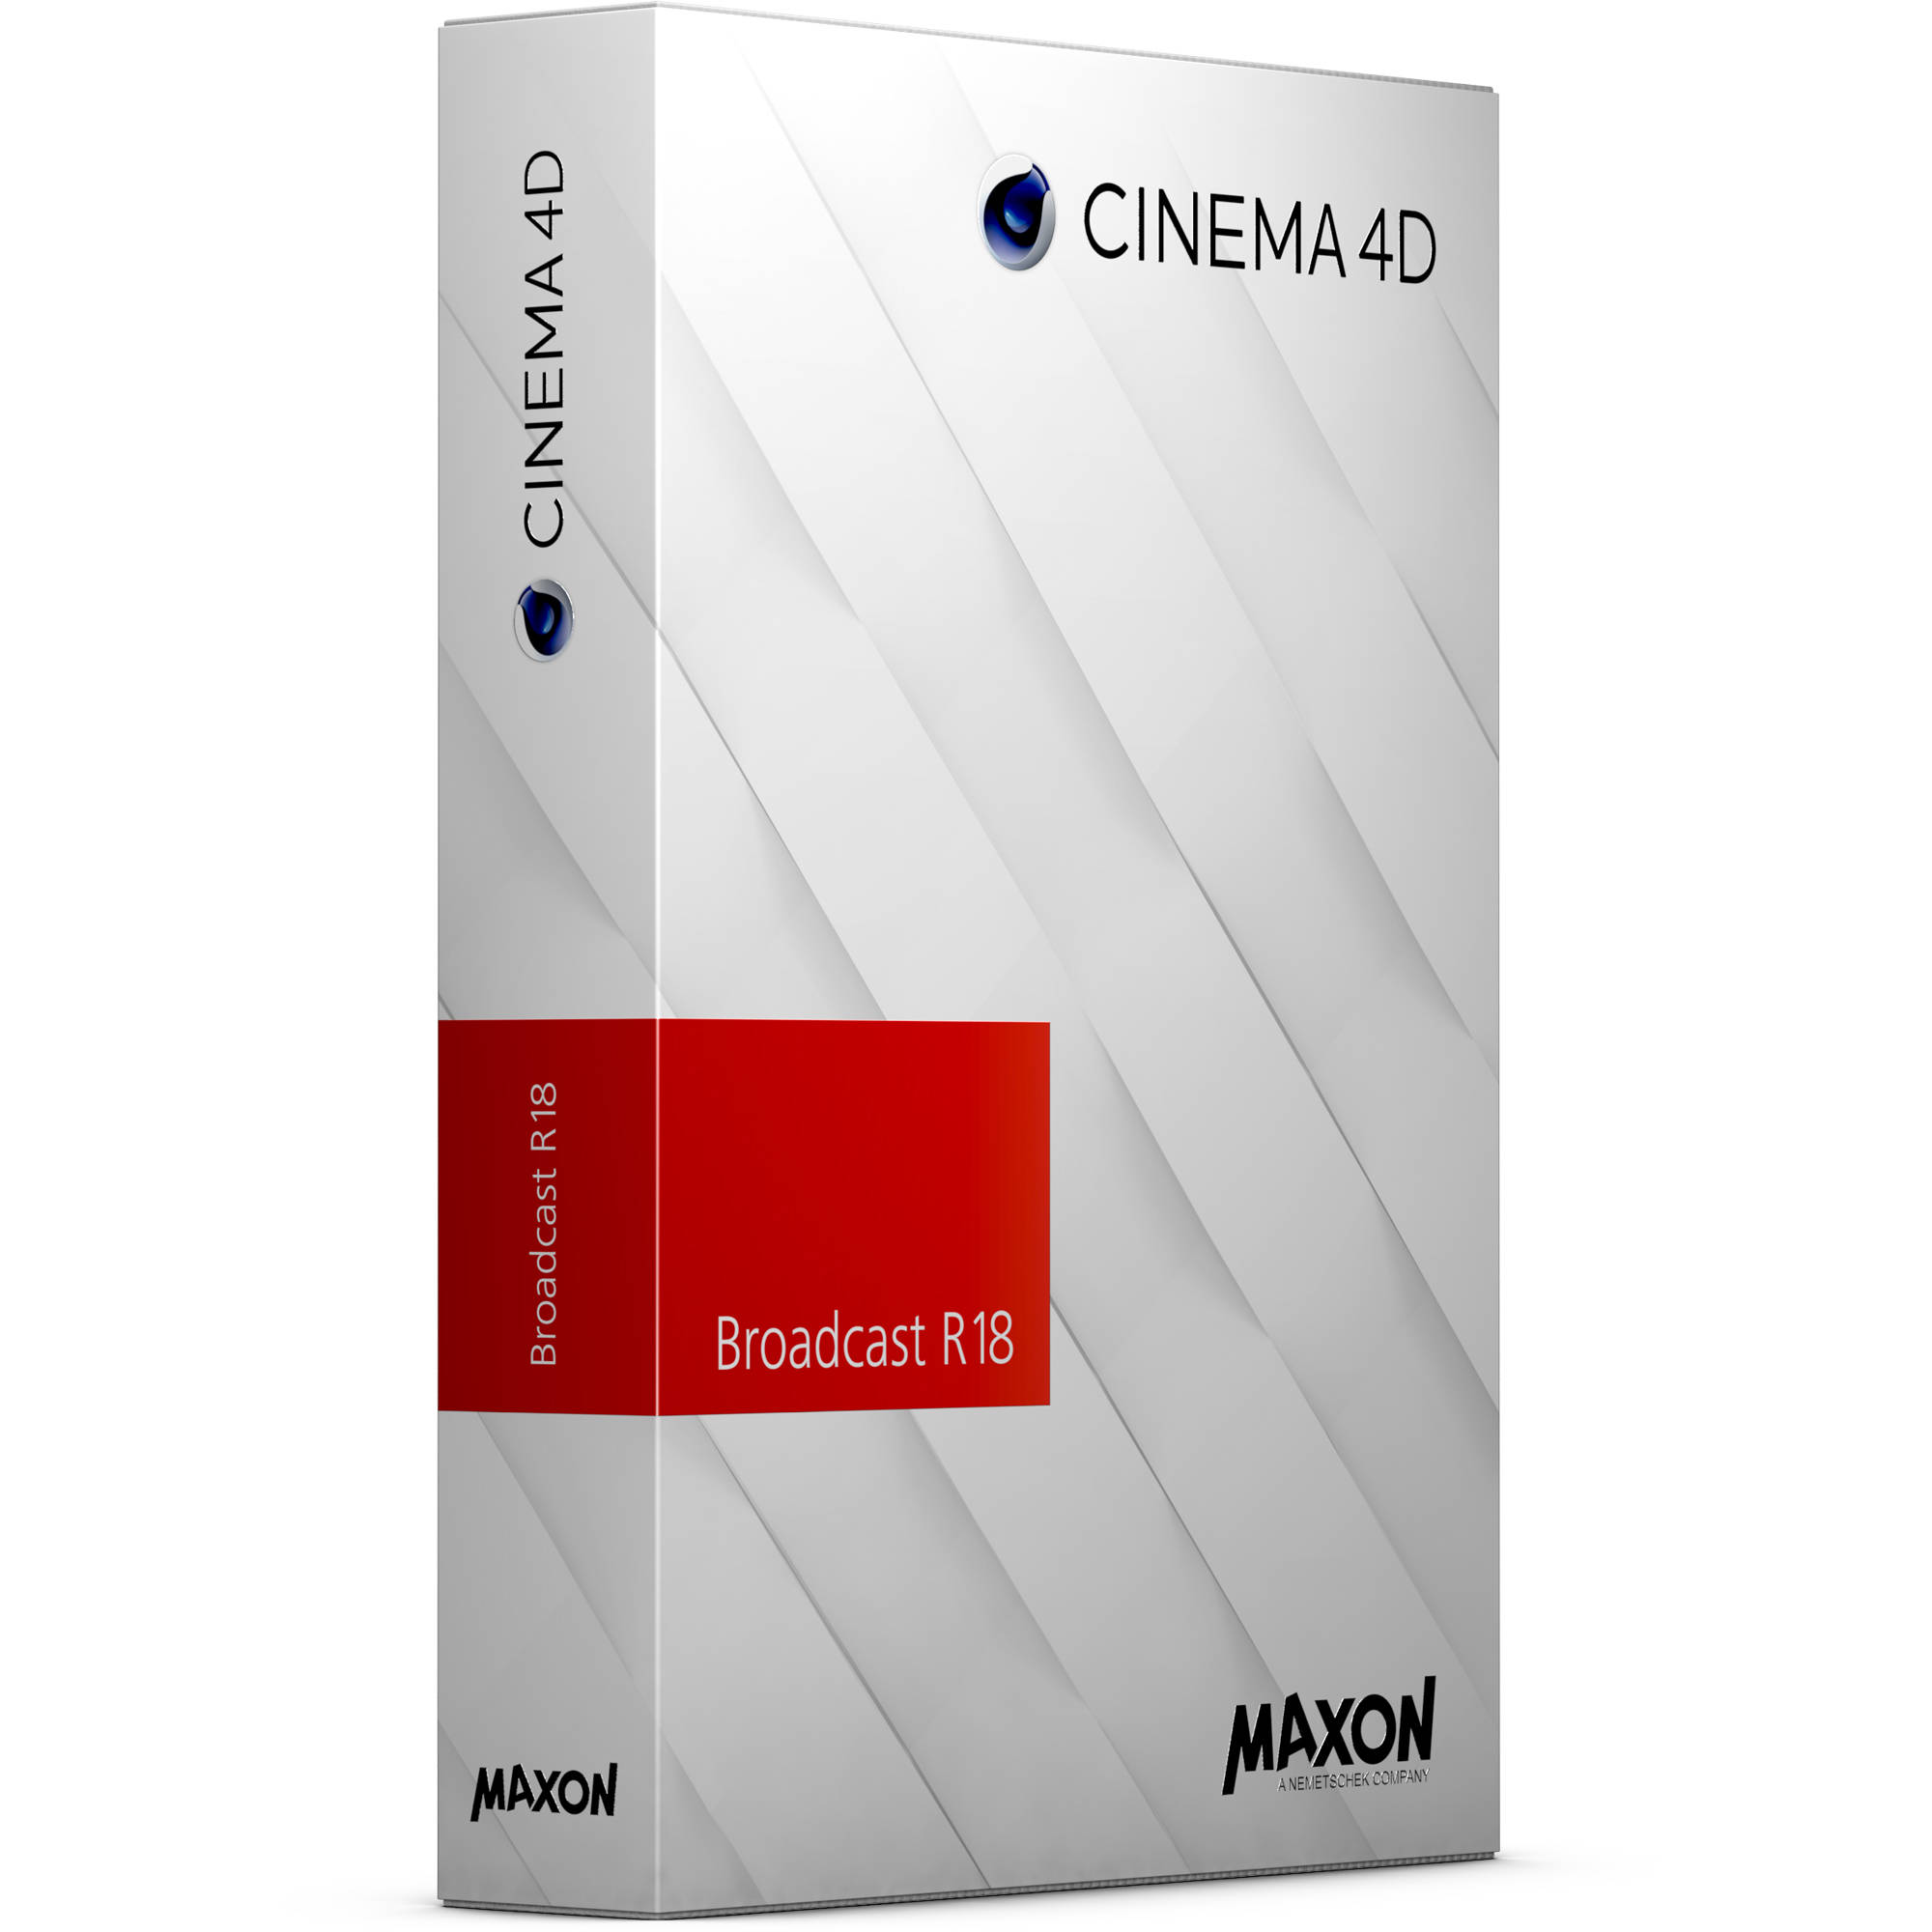 maxon cinema 4d broadcast r18 download c4dbe n 18 b h photo. Black Bedroom Furniture Sets. Home Design Ideas